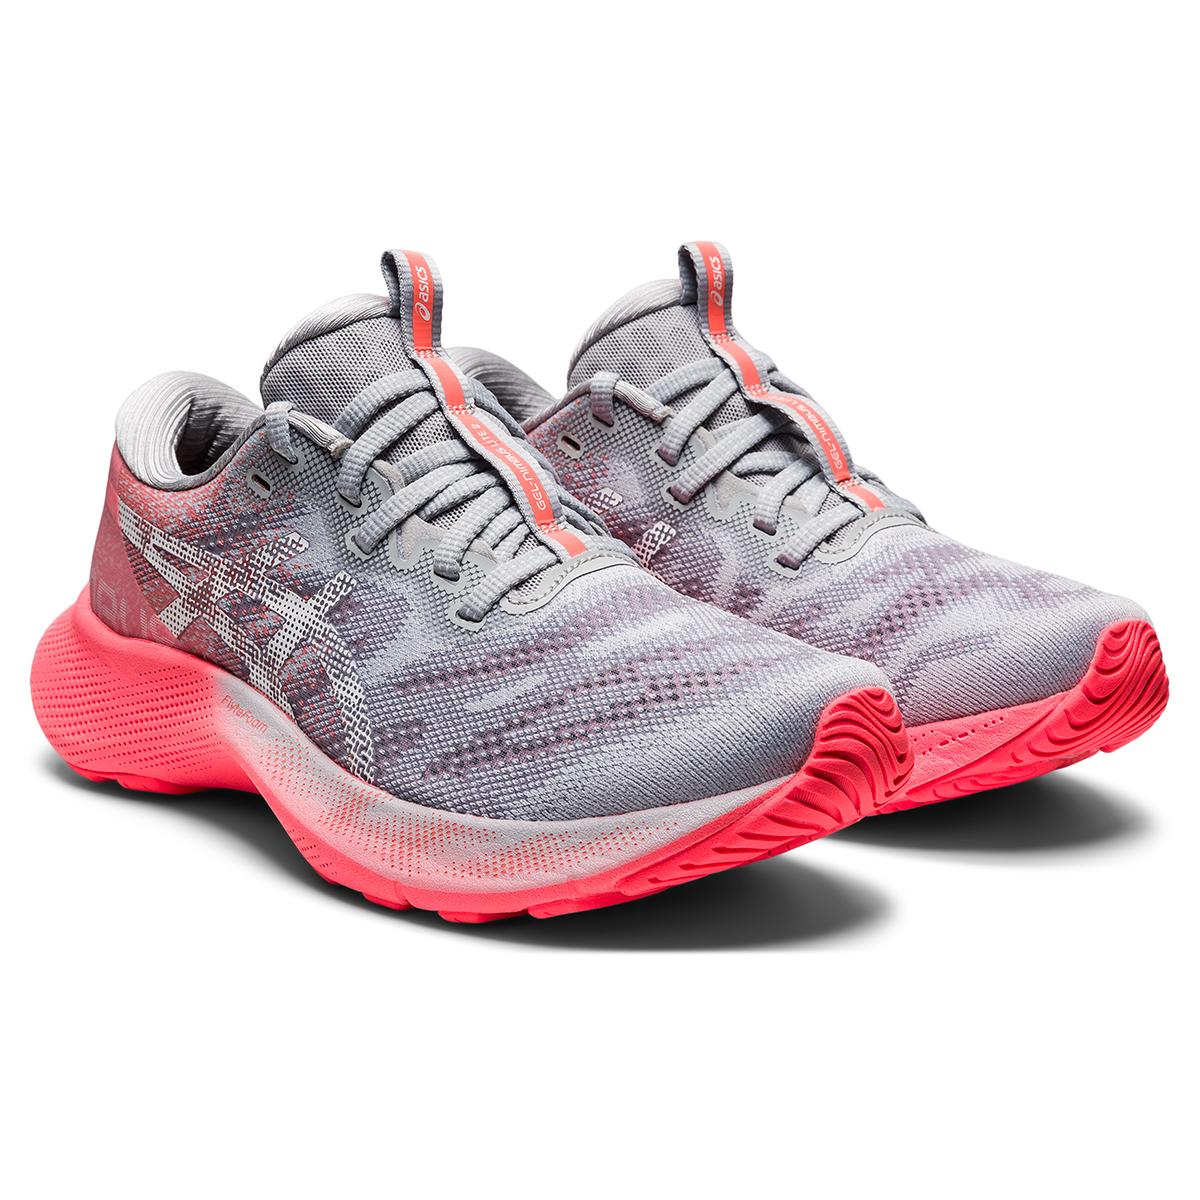 Women's Asics Gel-Nimbus Lite 2 Running Shoe - Color: Blazing Coral  - Size: 5 - Width: Regular, Blazing Coral, large, image 3